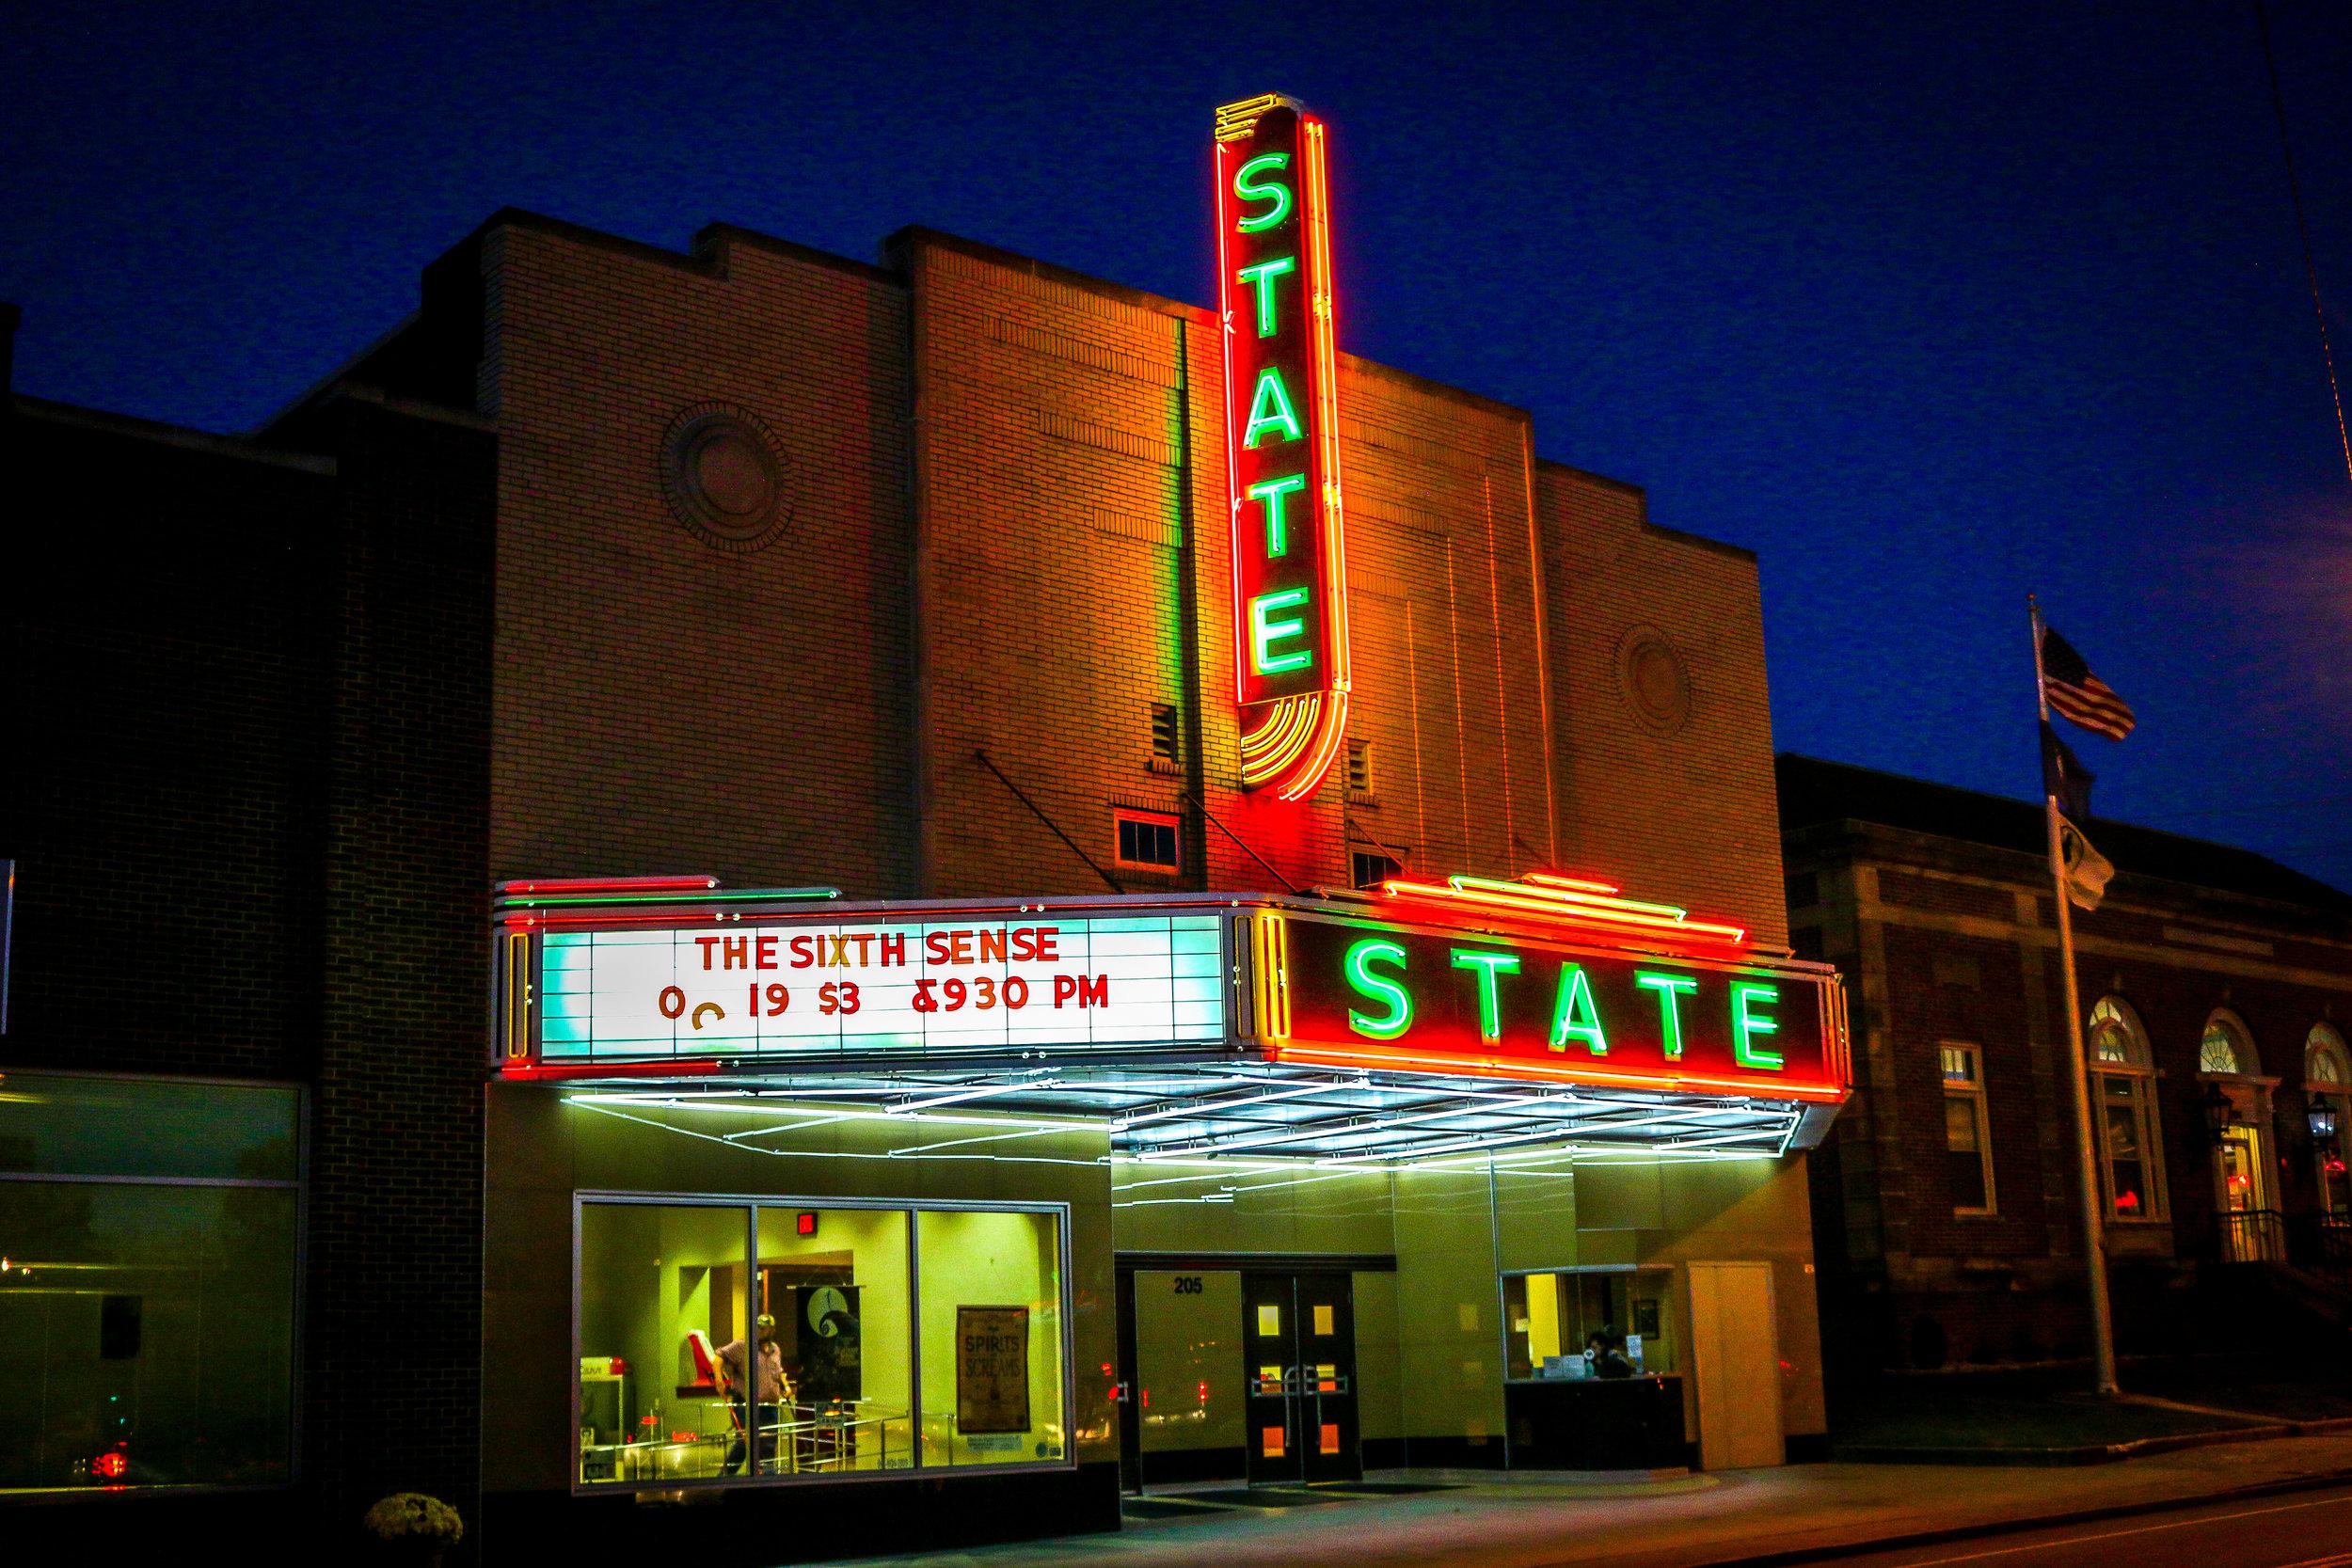 State Theater in Elizabethtown